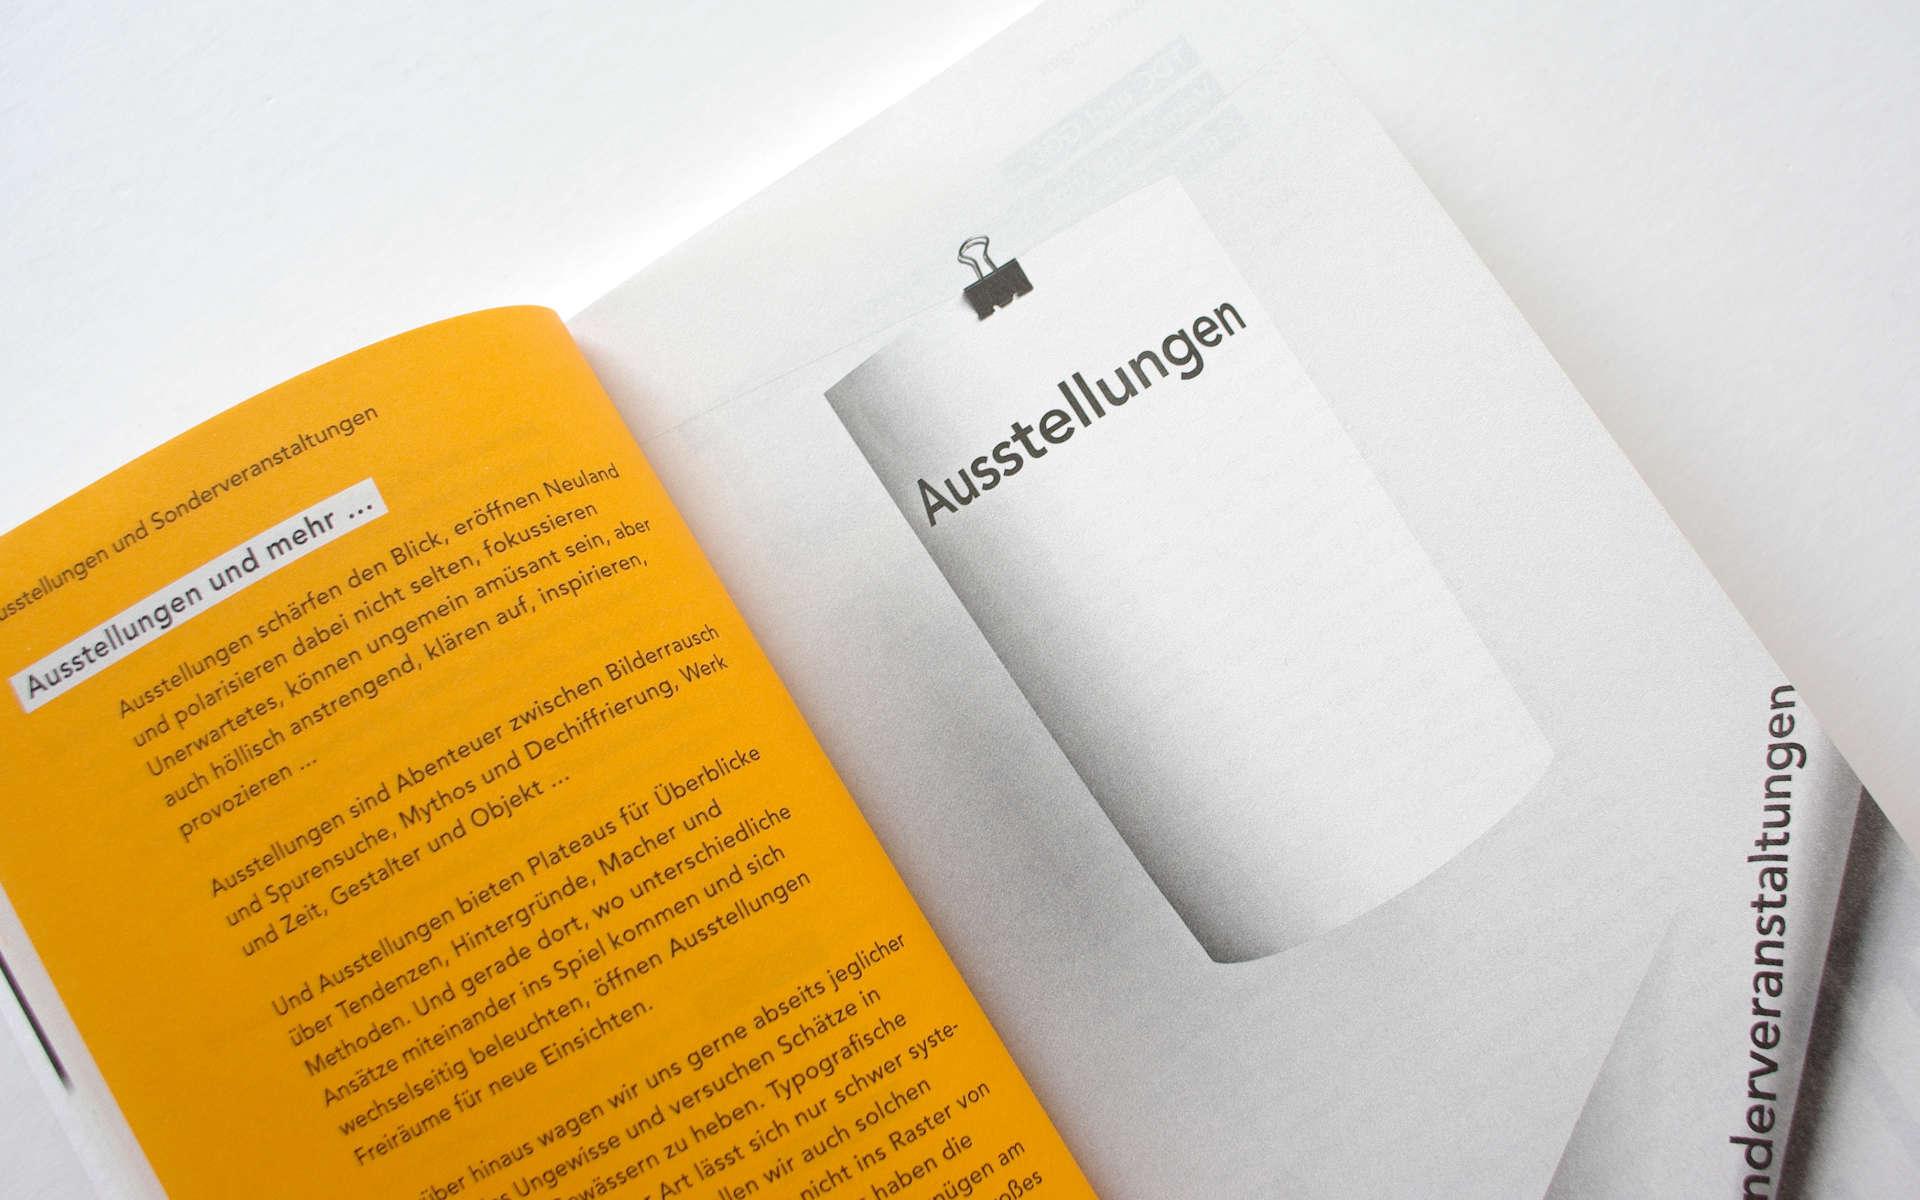 TGM Programmgestaltung Buch Design